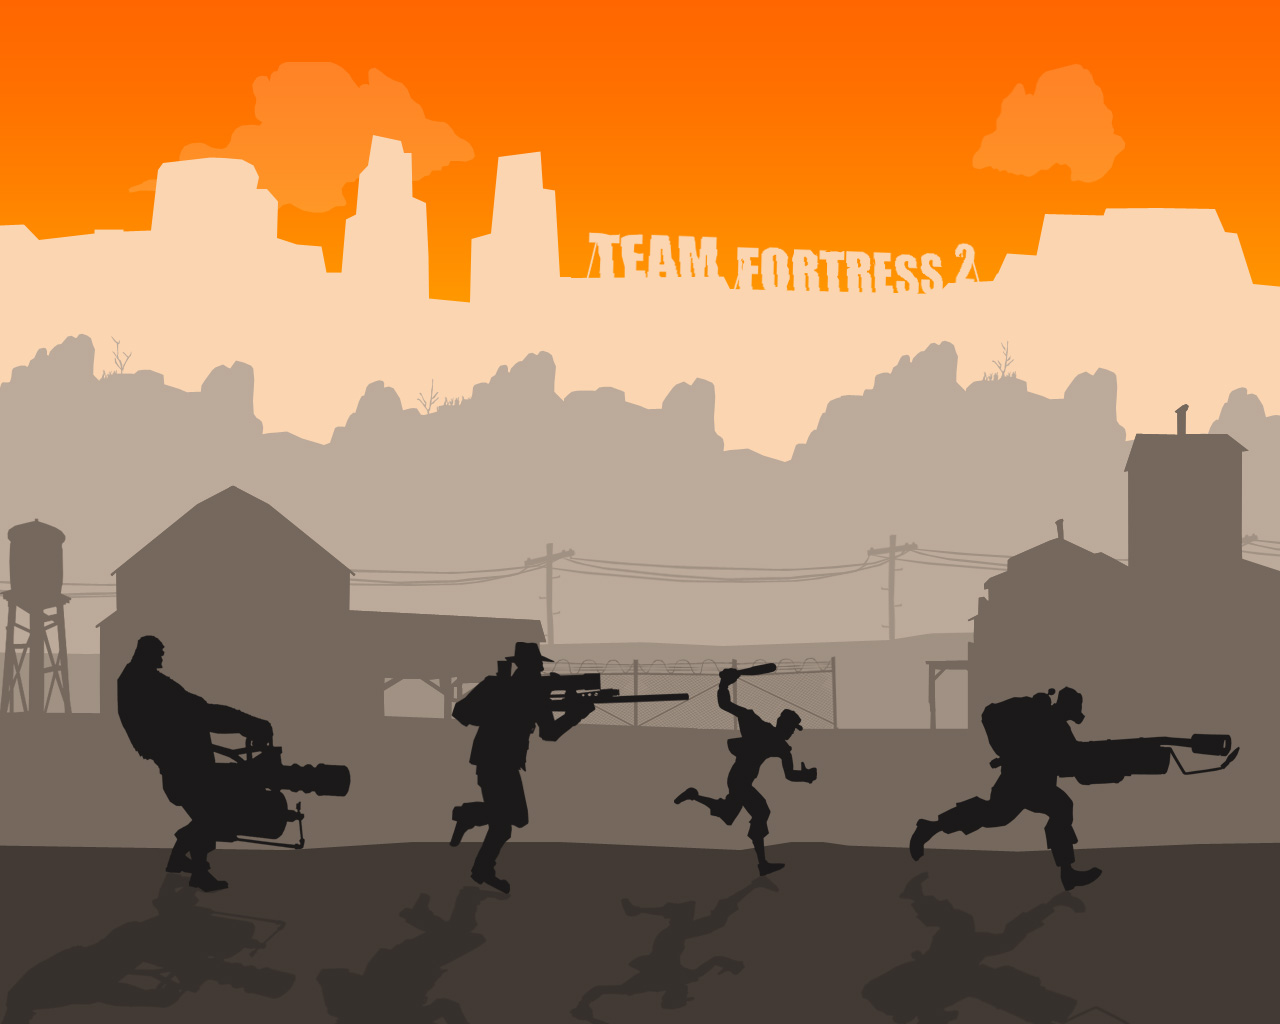 http://3.bp.blogspot.com/_-fa5I9IG9C4/TNpsMEs84YI/AAAAAAAAADg/kY6YljkssRg/s1600/wallpaper_team_fortress_2.jpg